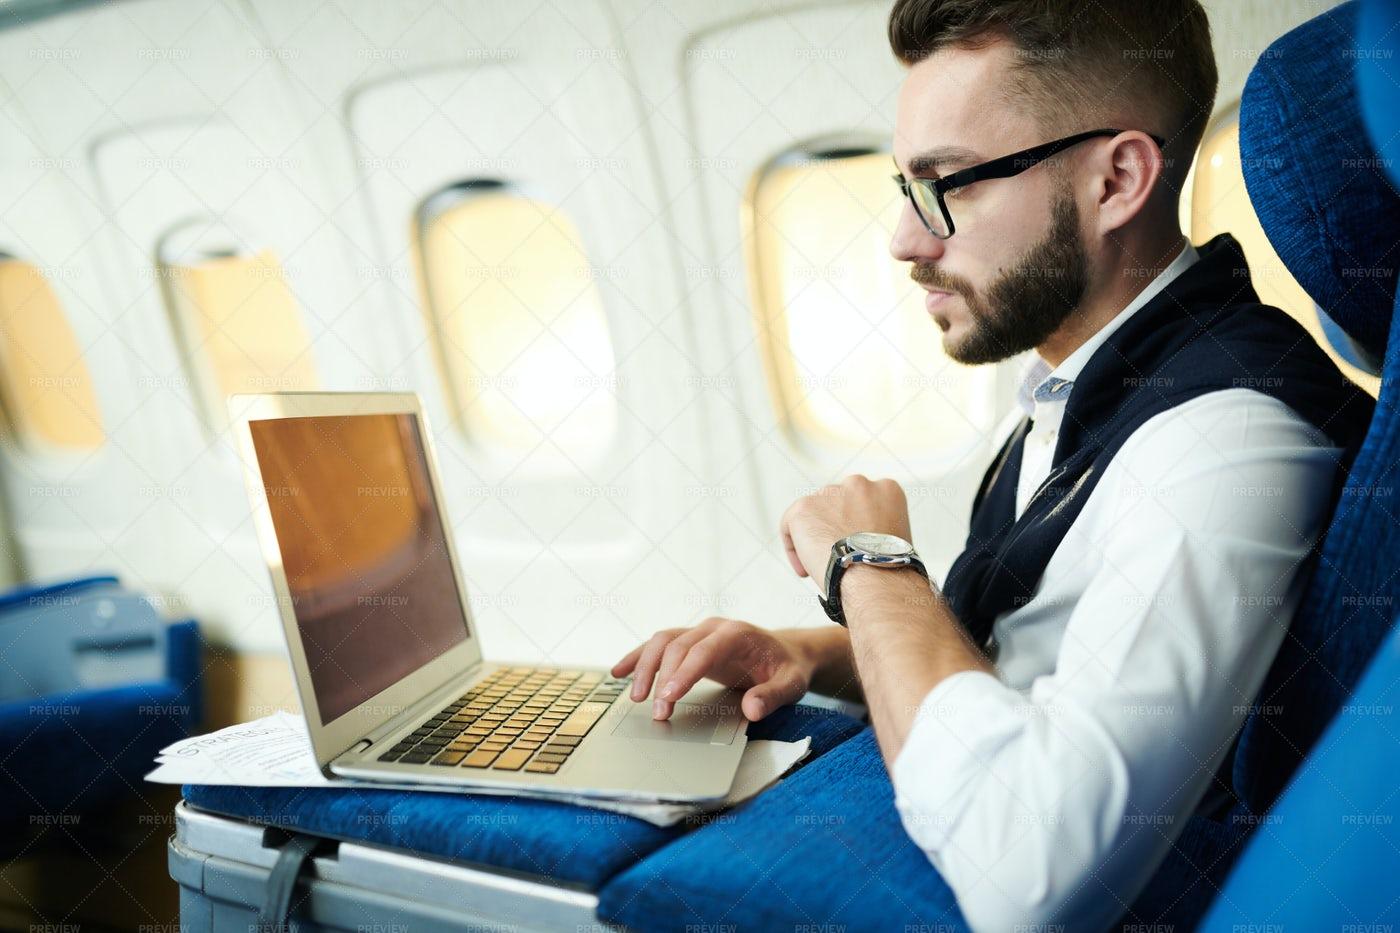 Man Working In Plane: Stock Photos